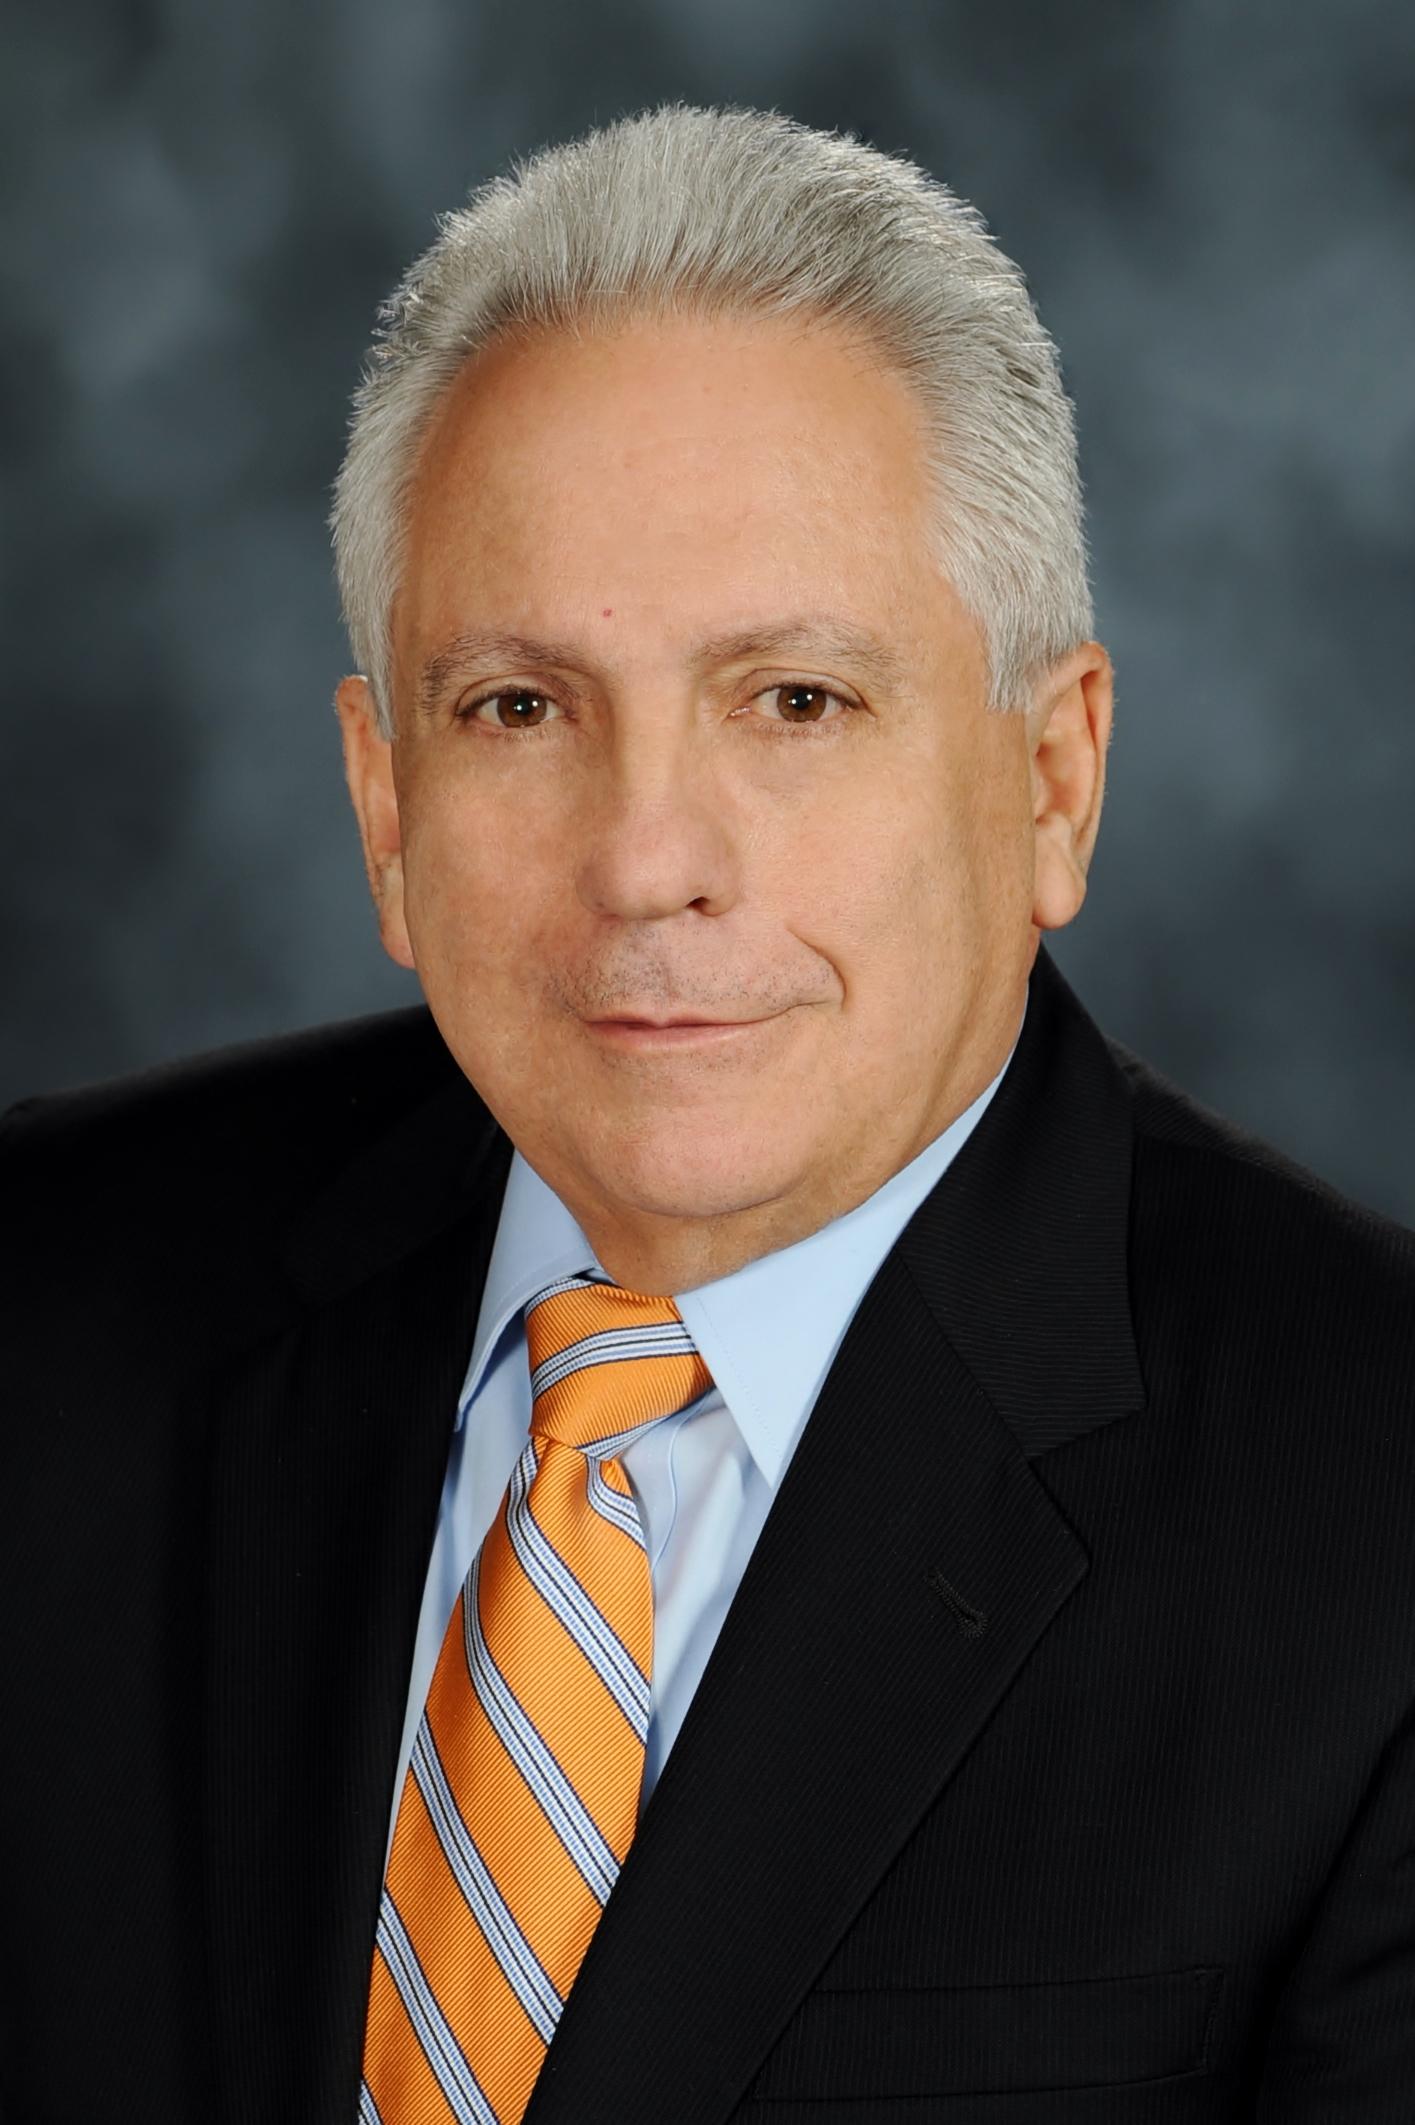 Vincent R. Masino